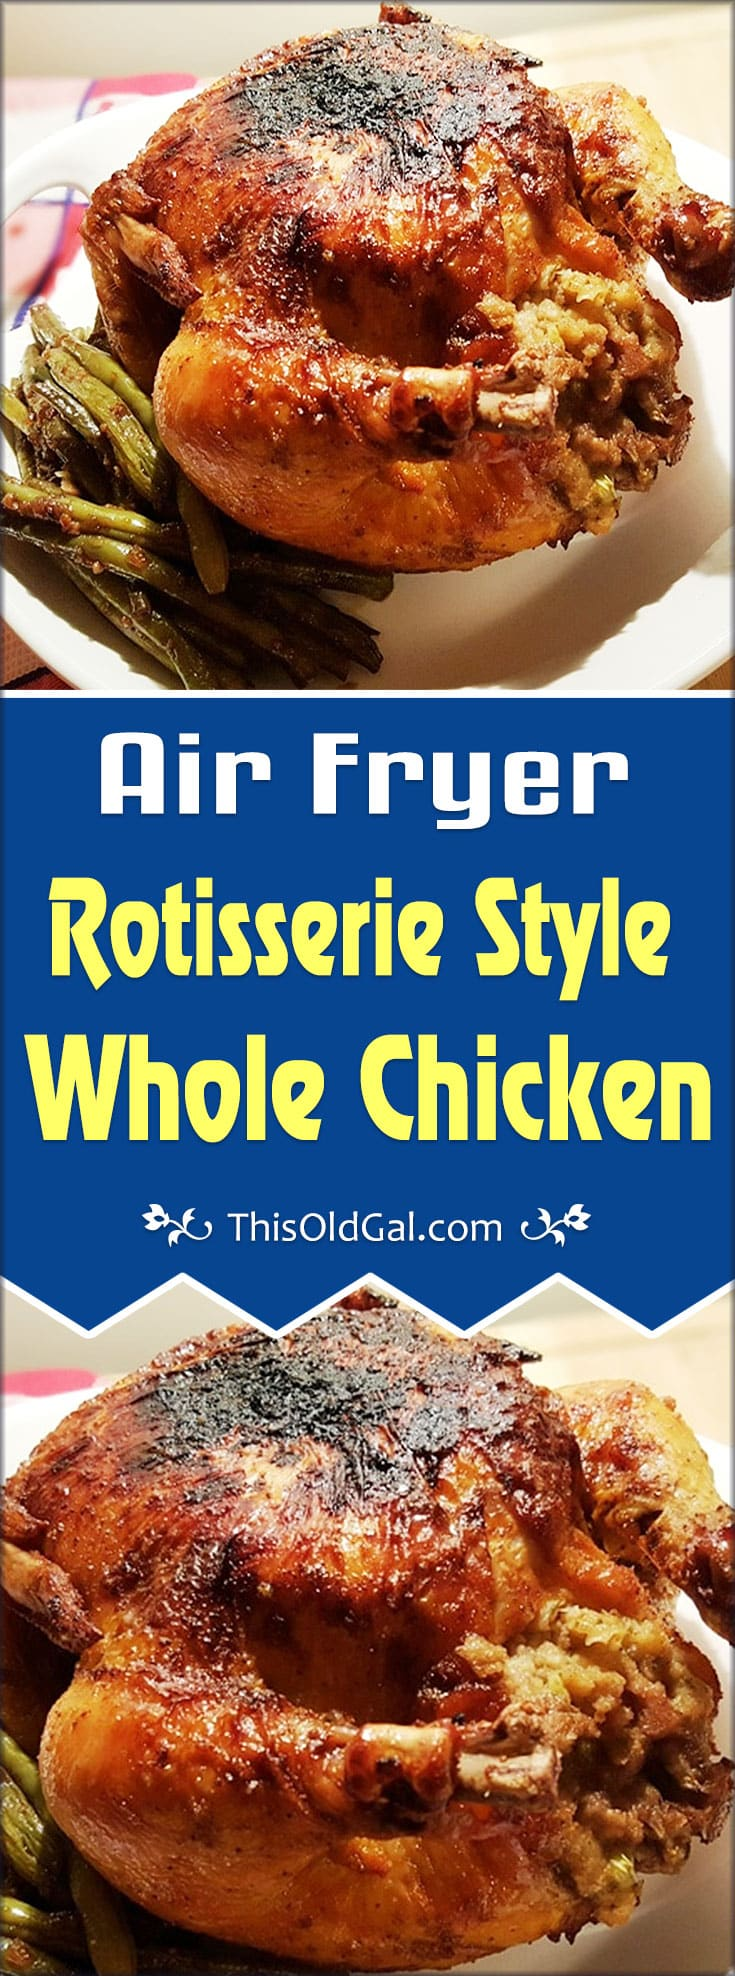 Rotisserie Style Whole Chicken Air Fryer Method